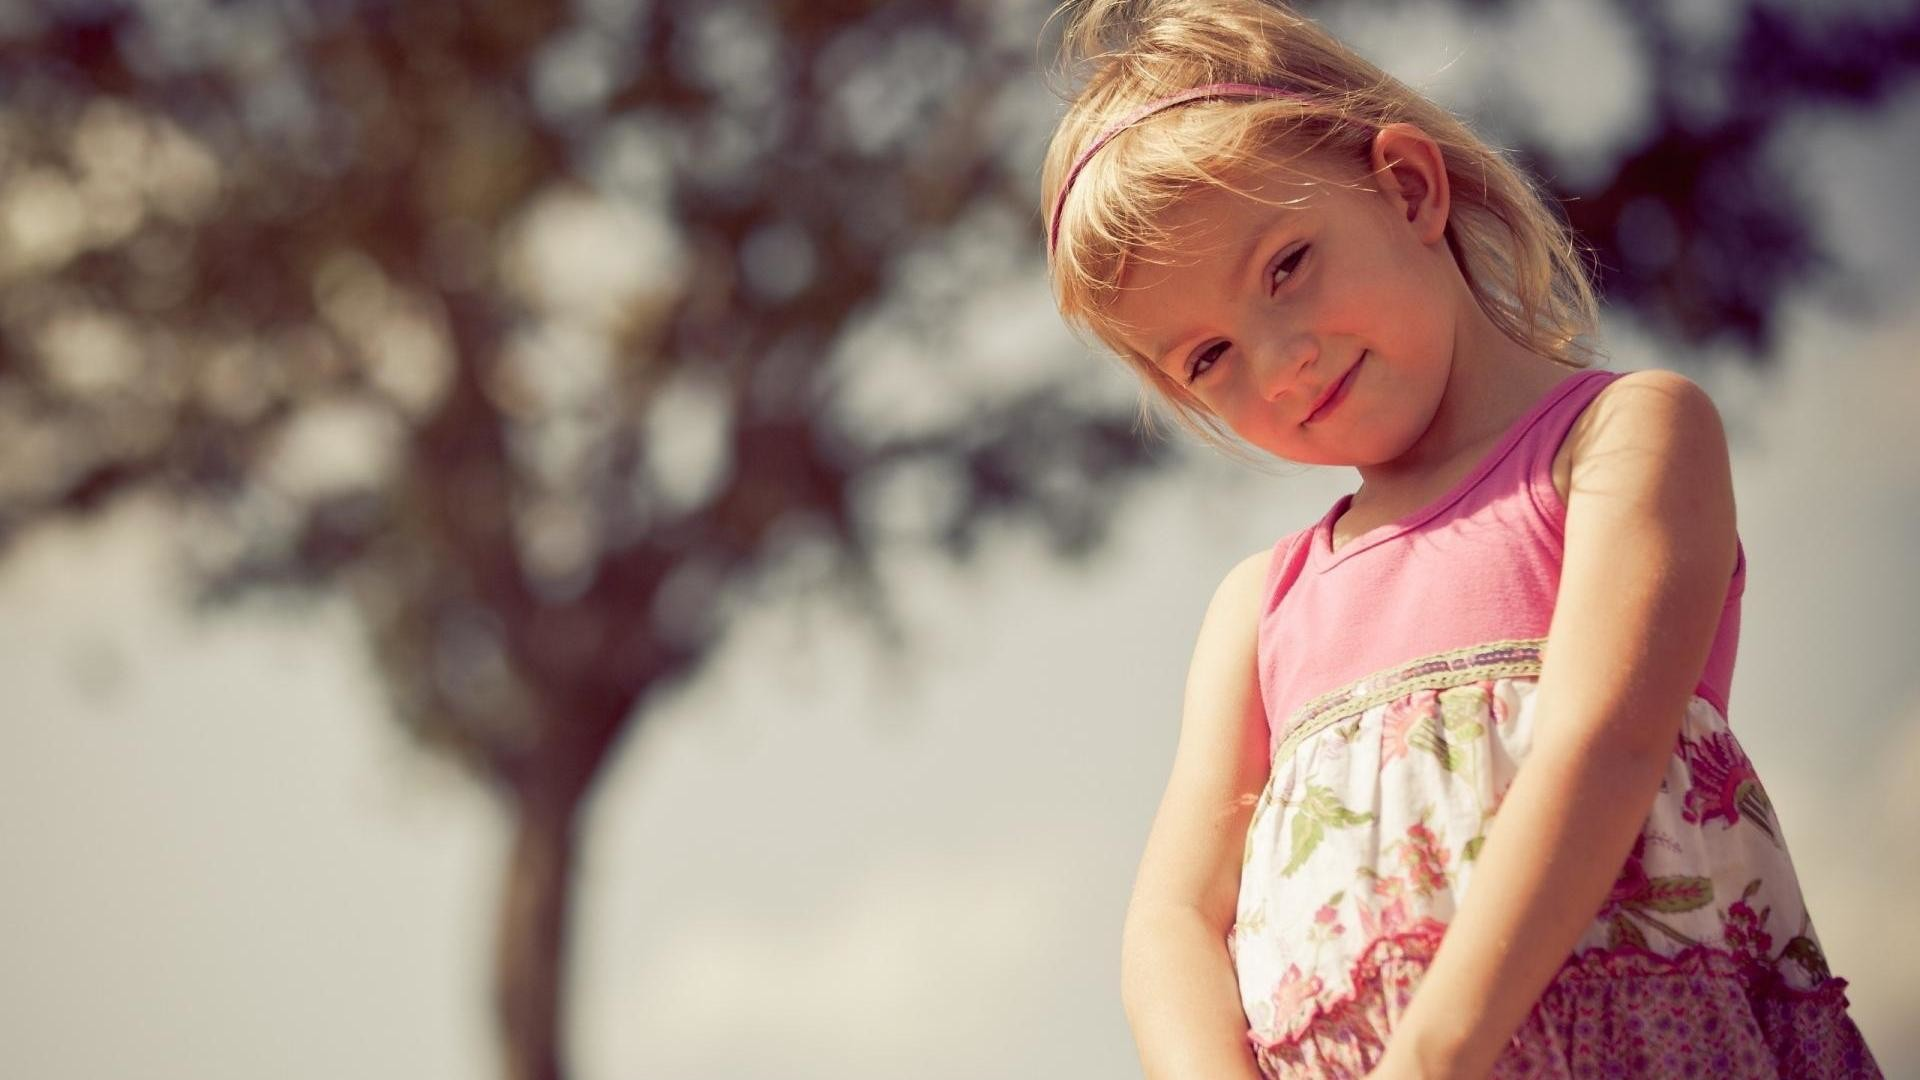 Cute Baby Girl Wallpaper HD Download For Desktop Mobile 1920×1080 Cute Baby  Girl Pic